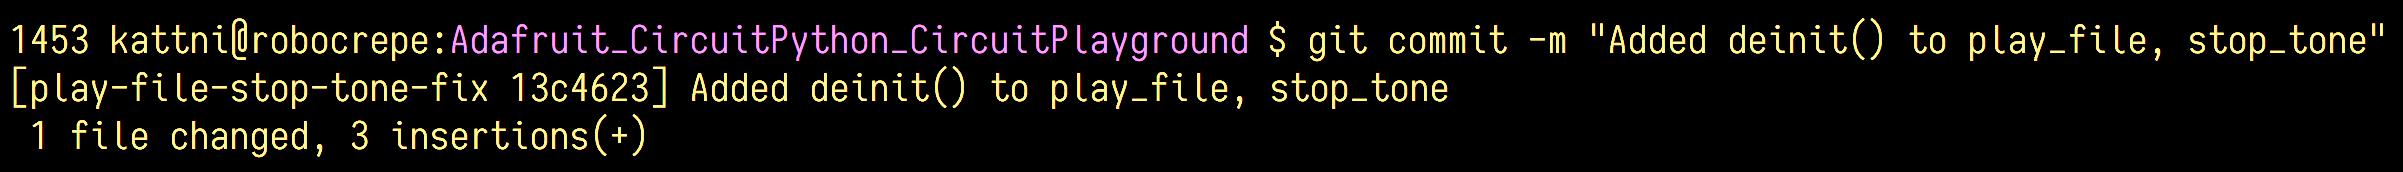 circuitpython_GitCommit.png